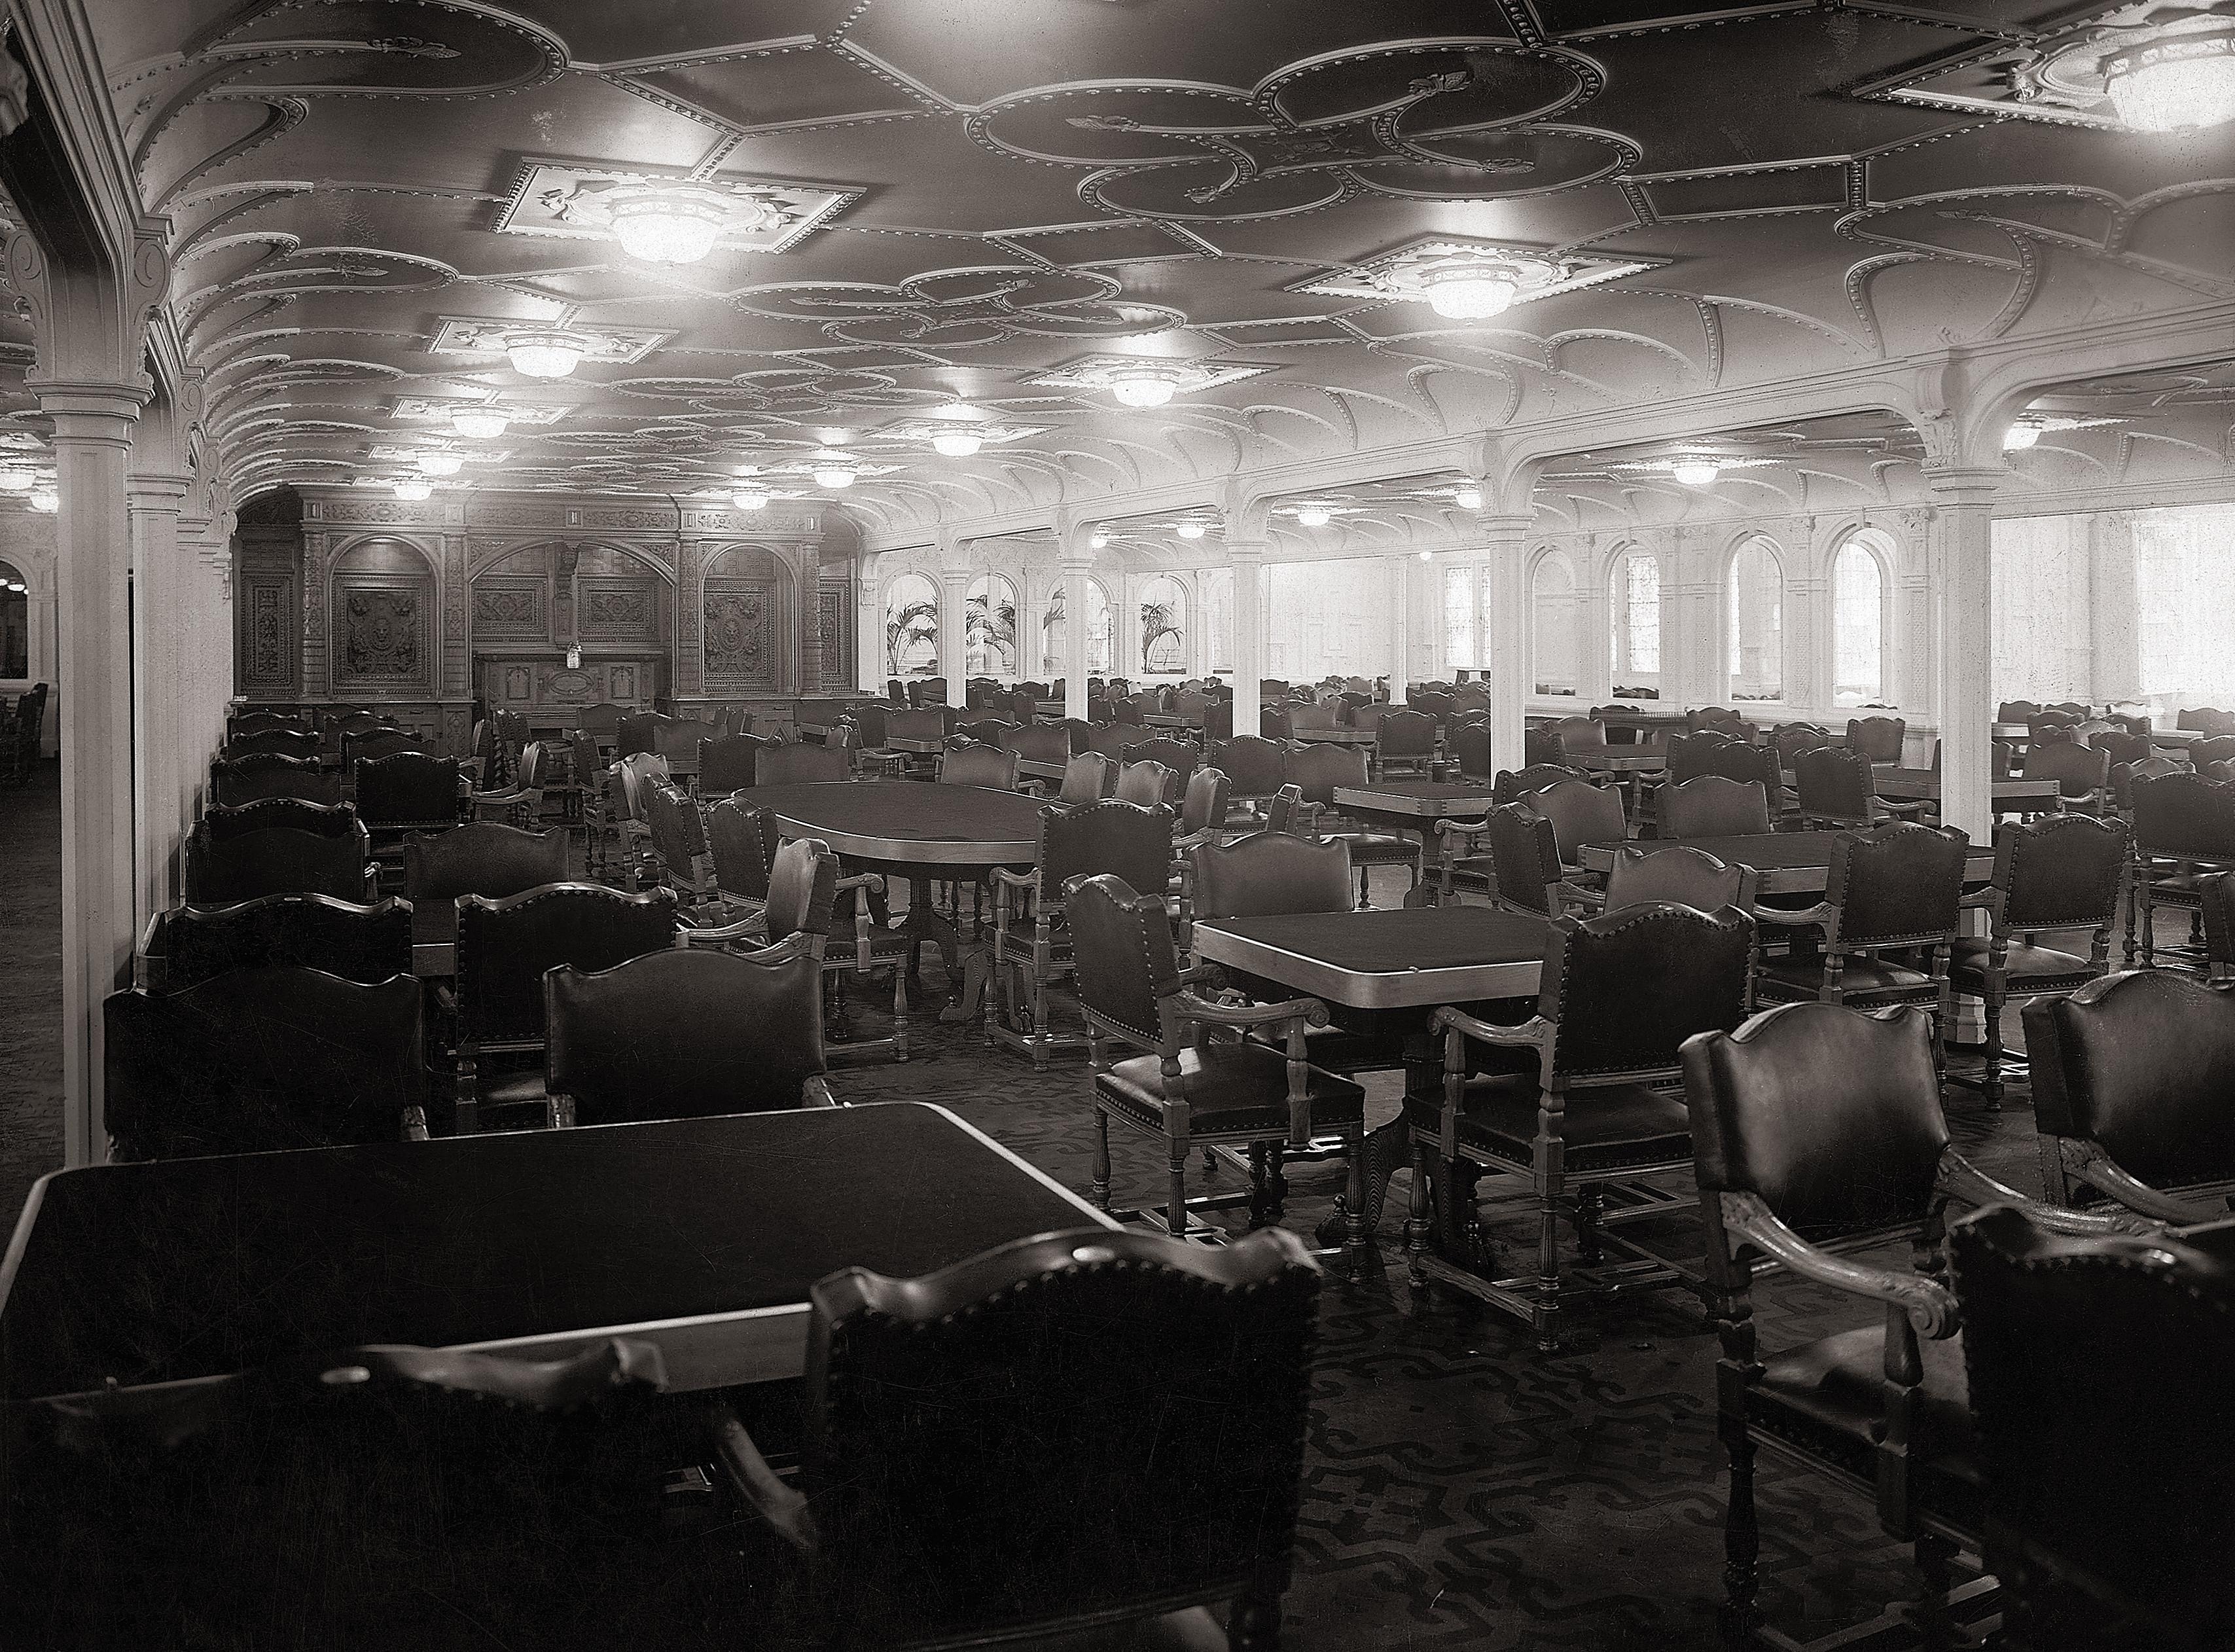 main-dining-room-of-the-titanic - titanic: passengers and